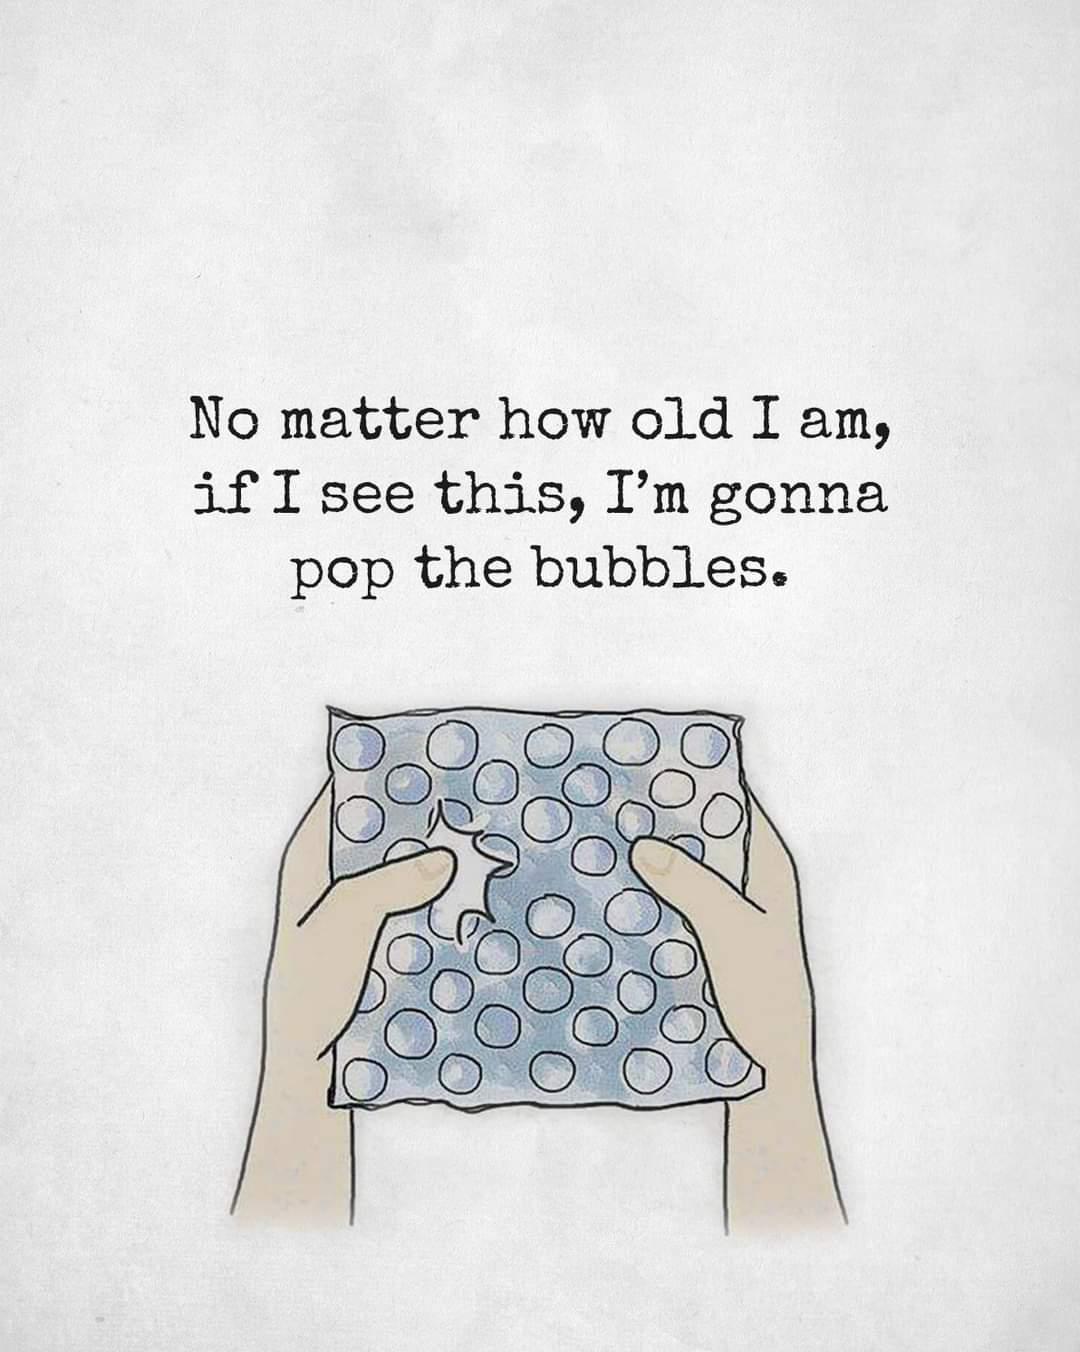 Memes Bubble wrap no matter how old I am